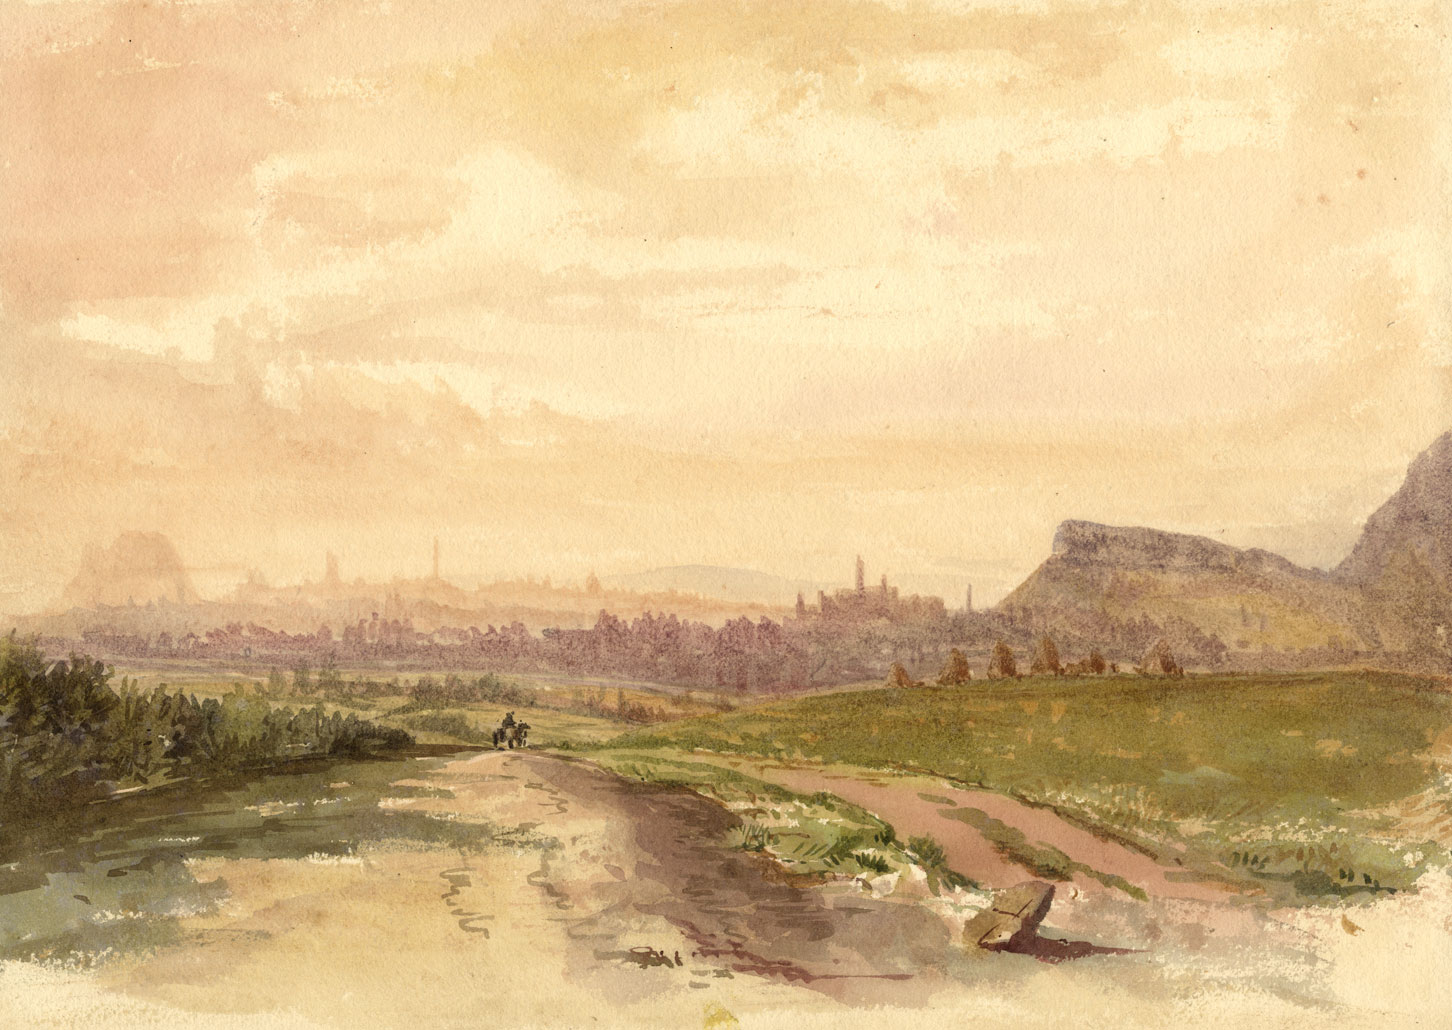 Edinburgh Skyline De Rosslyn Road Late Peinture A L Aquarelle Du 19eme Siecle Ebay